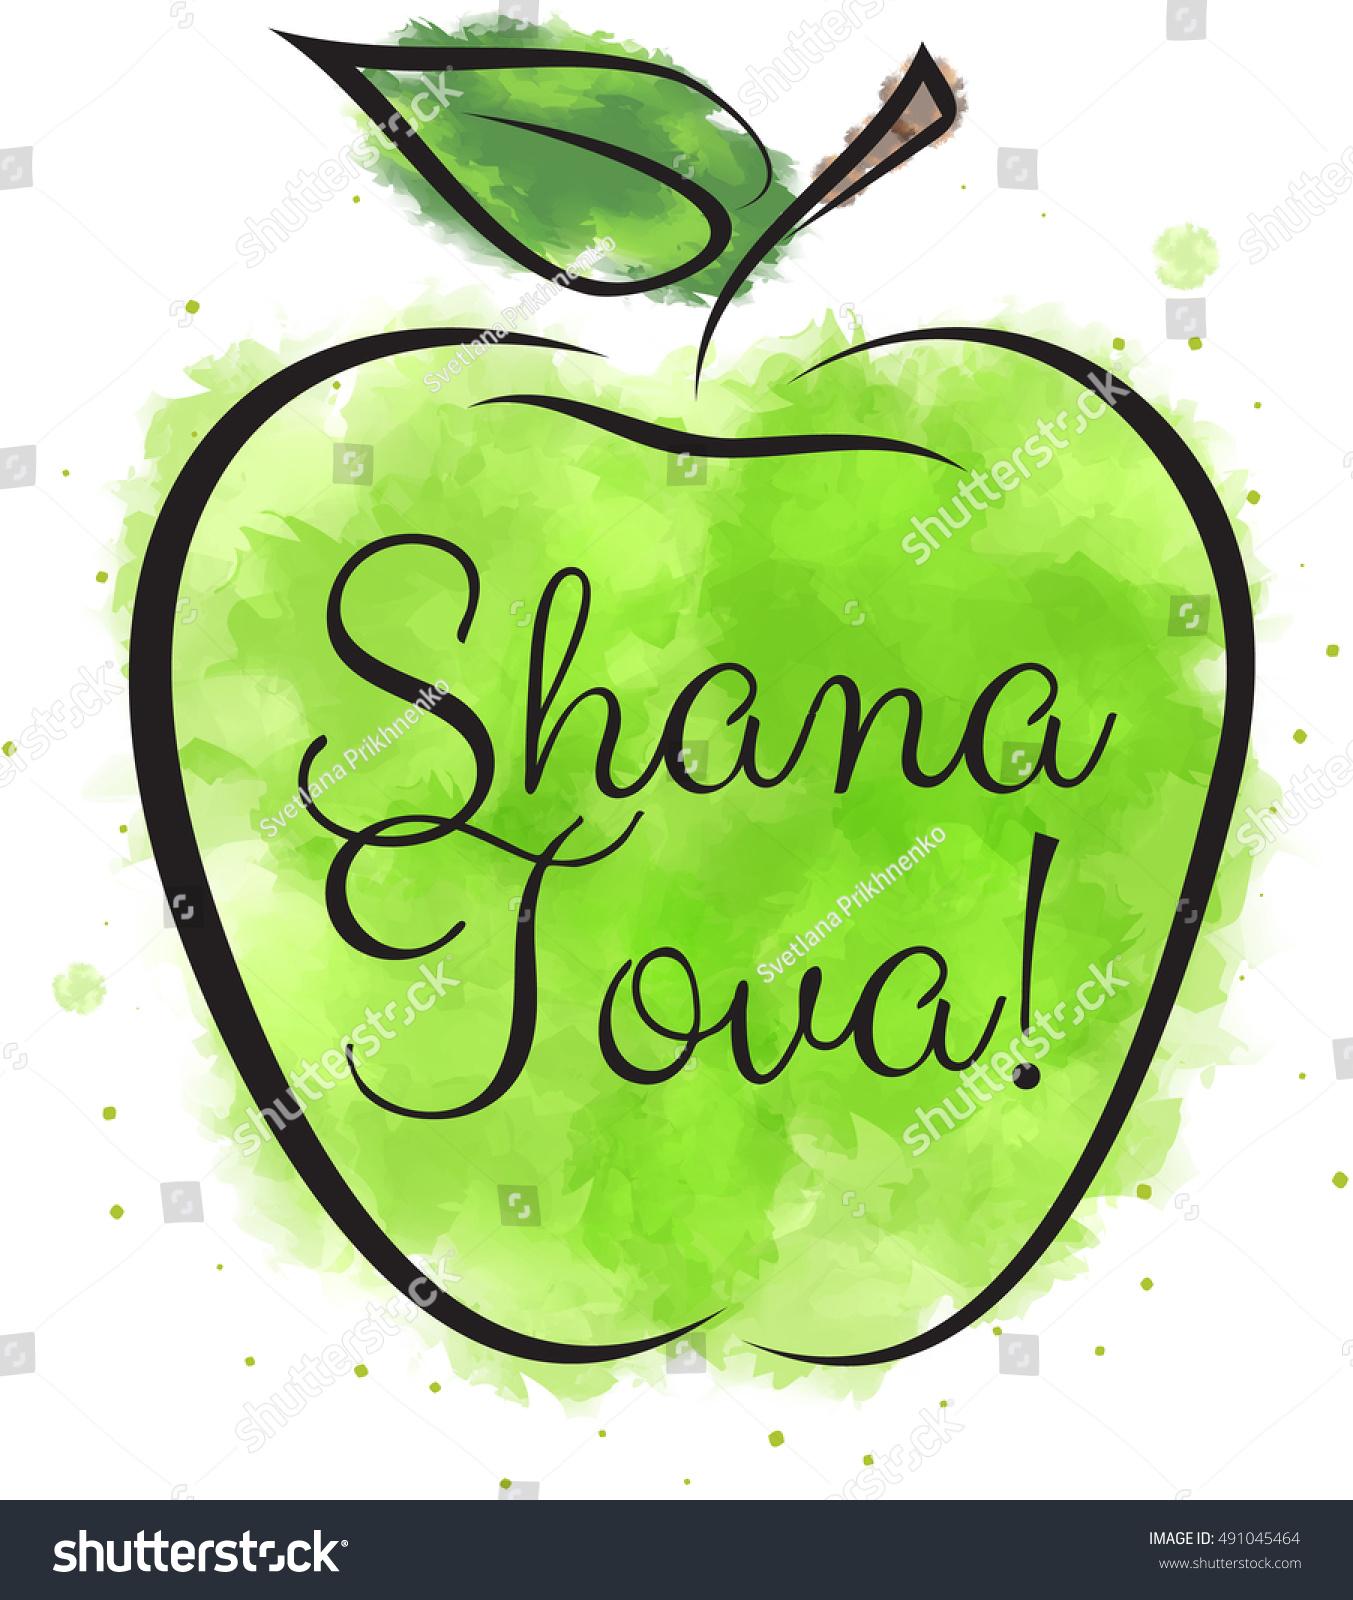 Green Watercolor Apple Greetings Jewish Holiday Stock Illustration